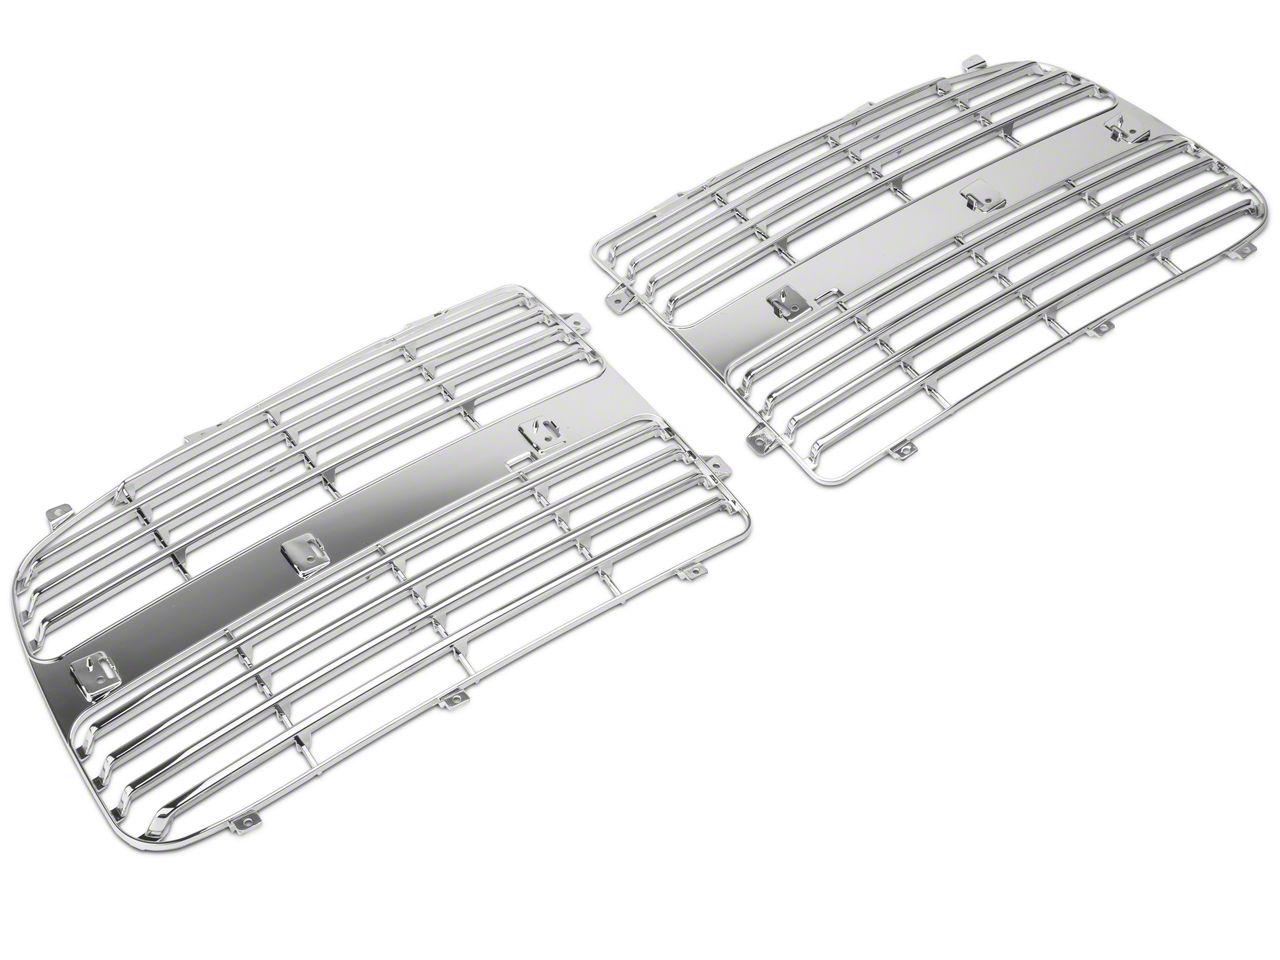 SpeedForm Upper Replacement Grille Inserts - Chrome (02-05 RAM 1500)